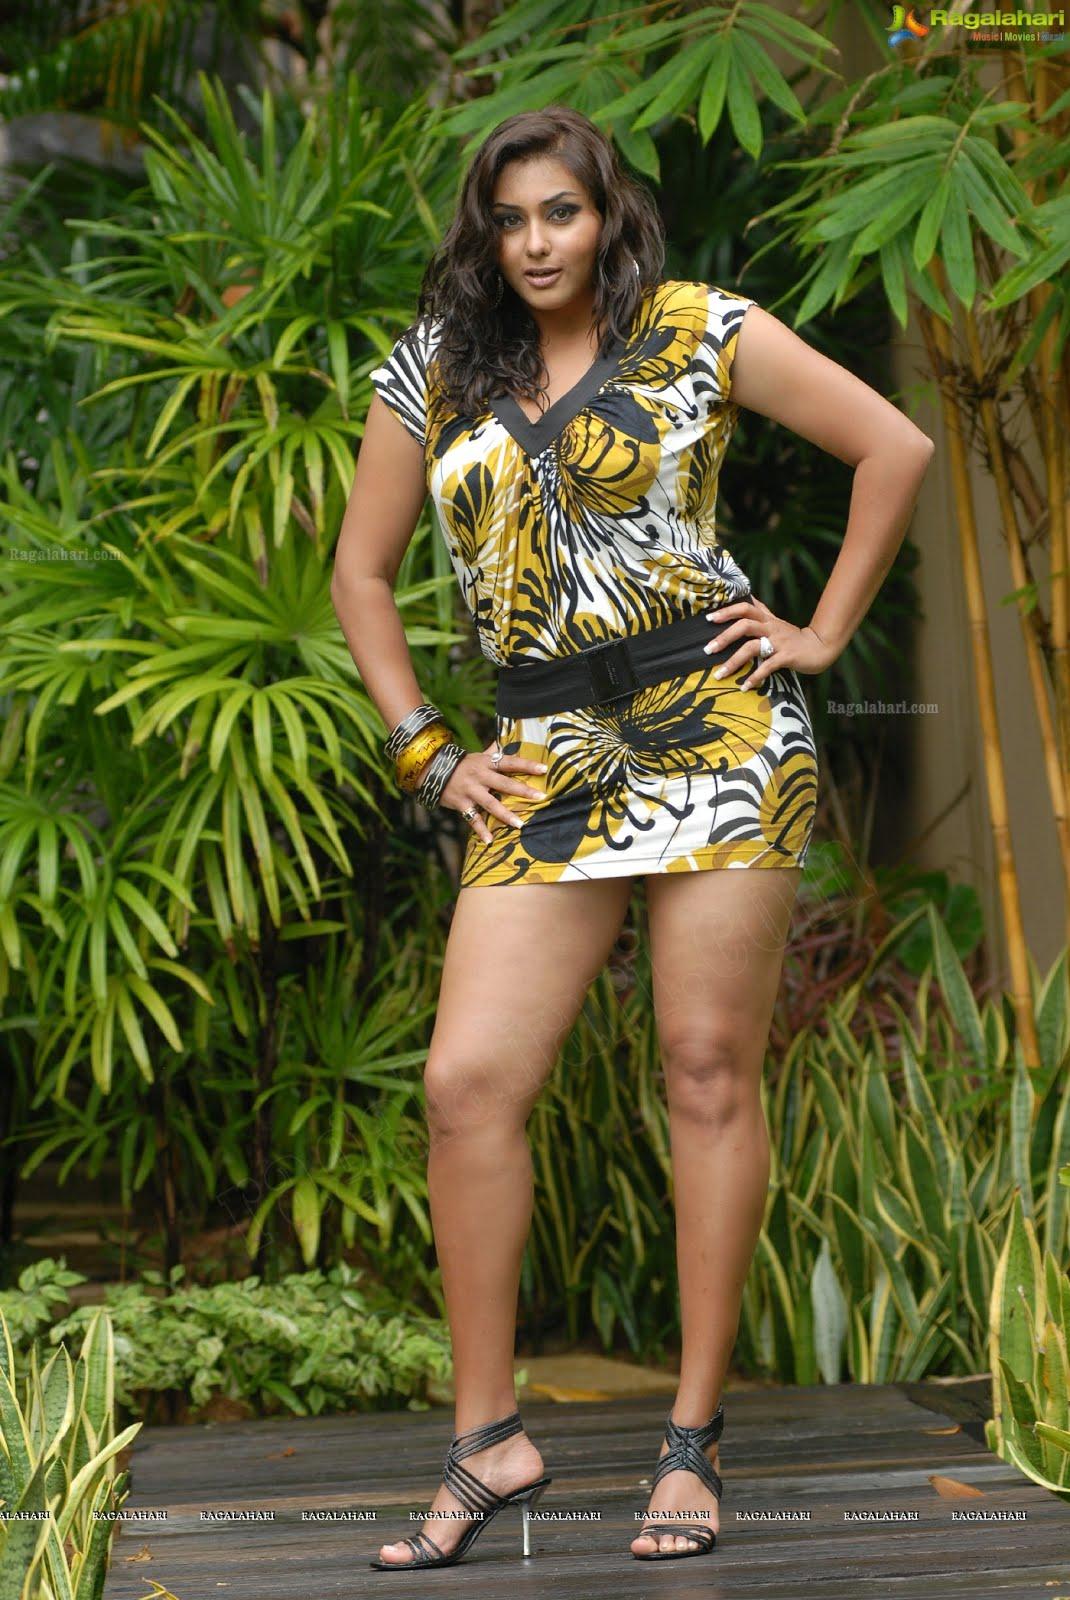 [HD Pics] Namitha very Hot Big Thighs Show Images - Hot ...